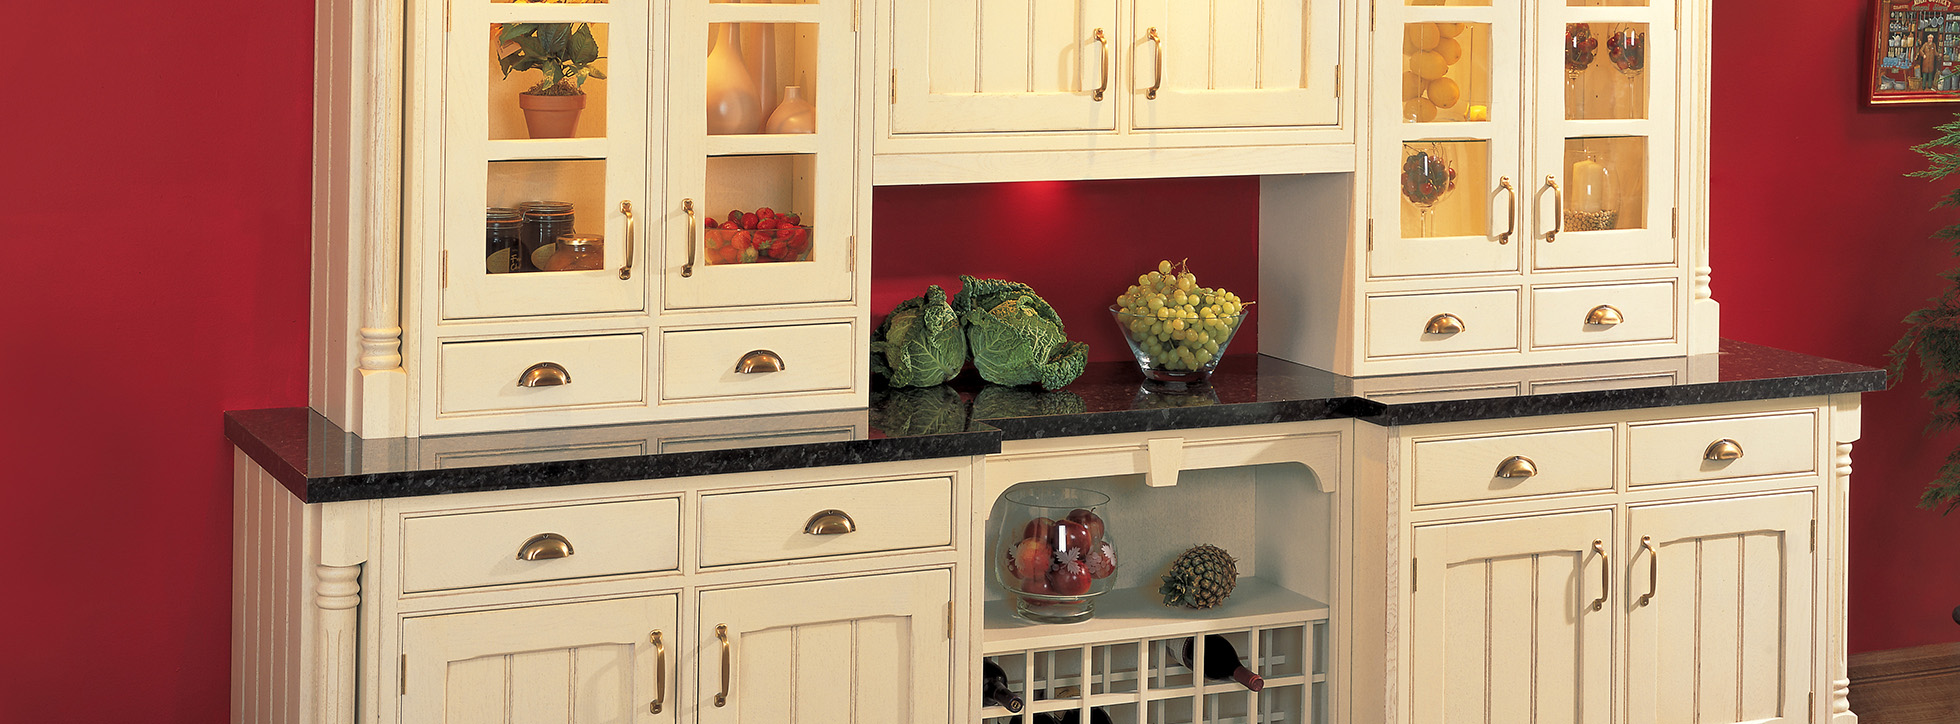 Super Marpatt Kitchen Doors Suppliers To The Trade Download Free Architecture Designs Grimeyleaguecom